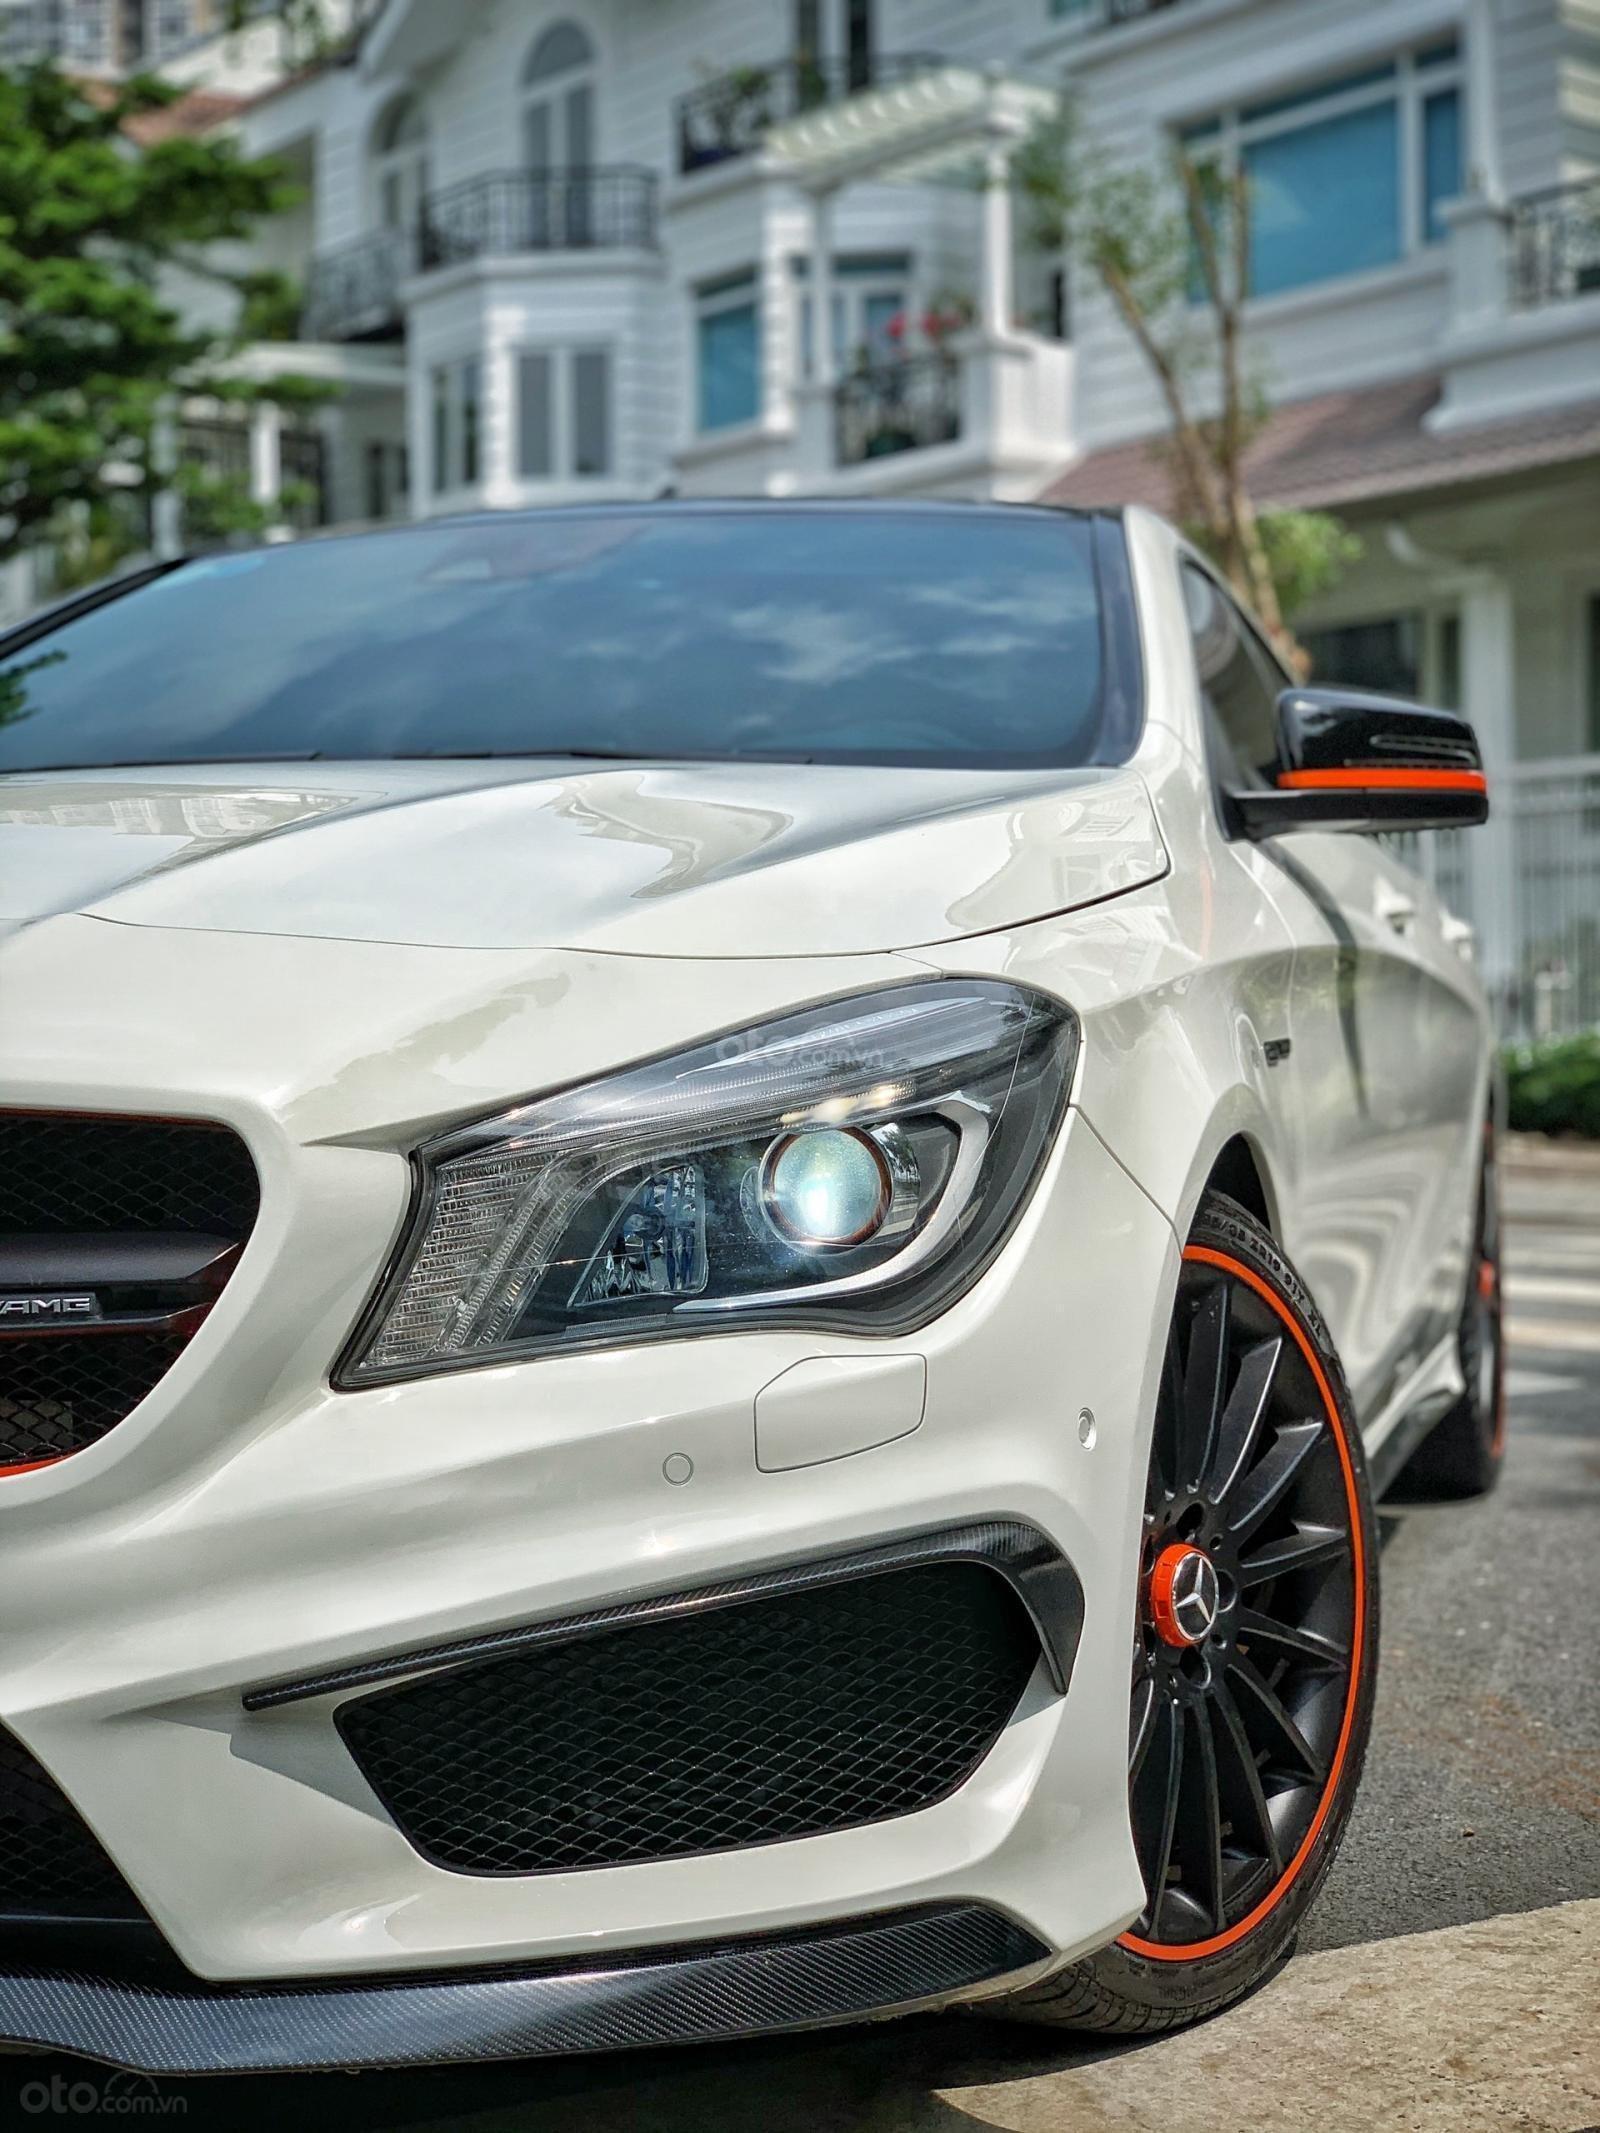 Bán xe Mercedes CLA 45AMG Orange Art đời 2016 full option, giá chỉ 1 tỷ 65 (7)